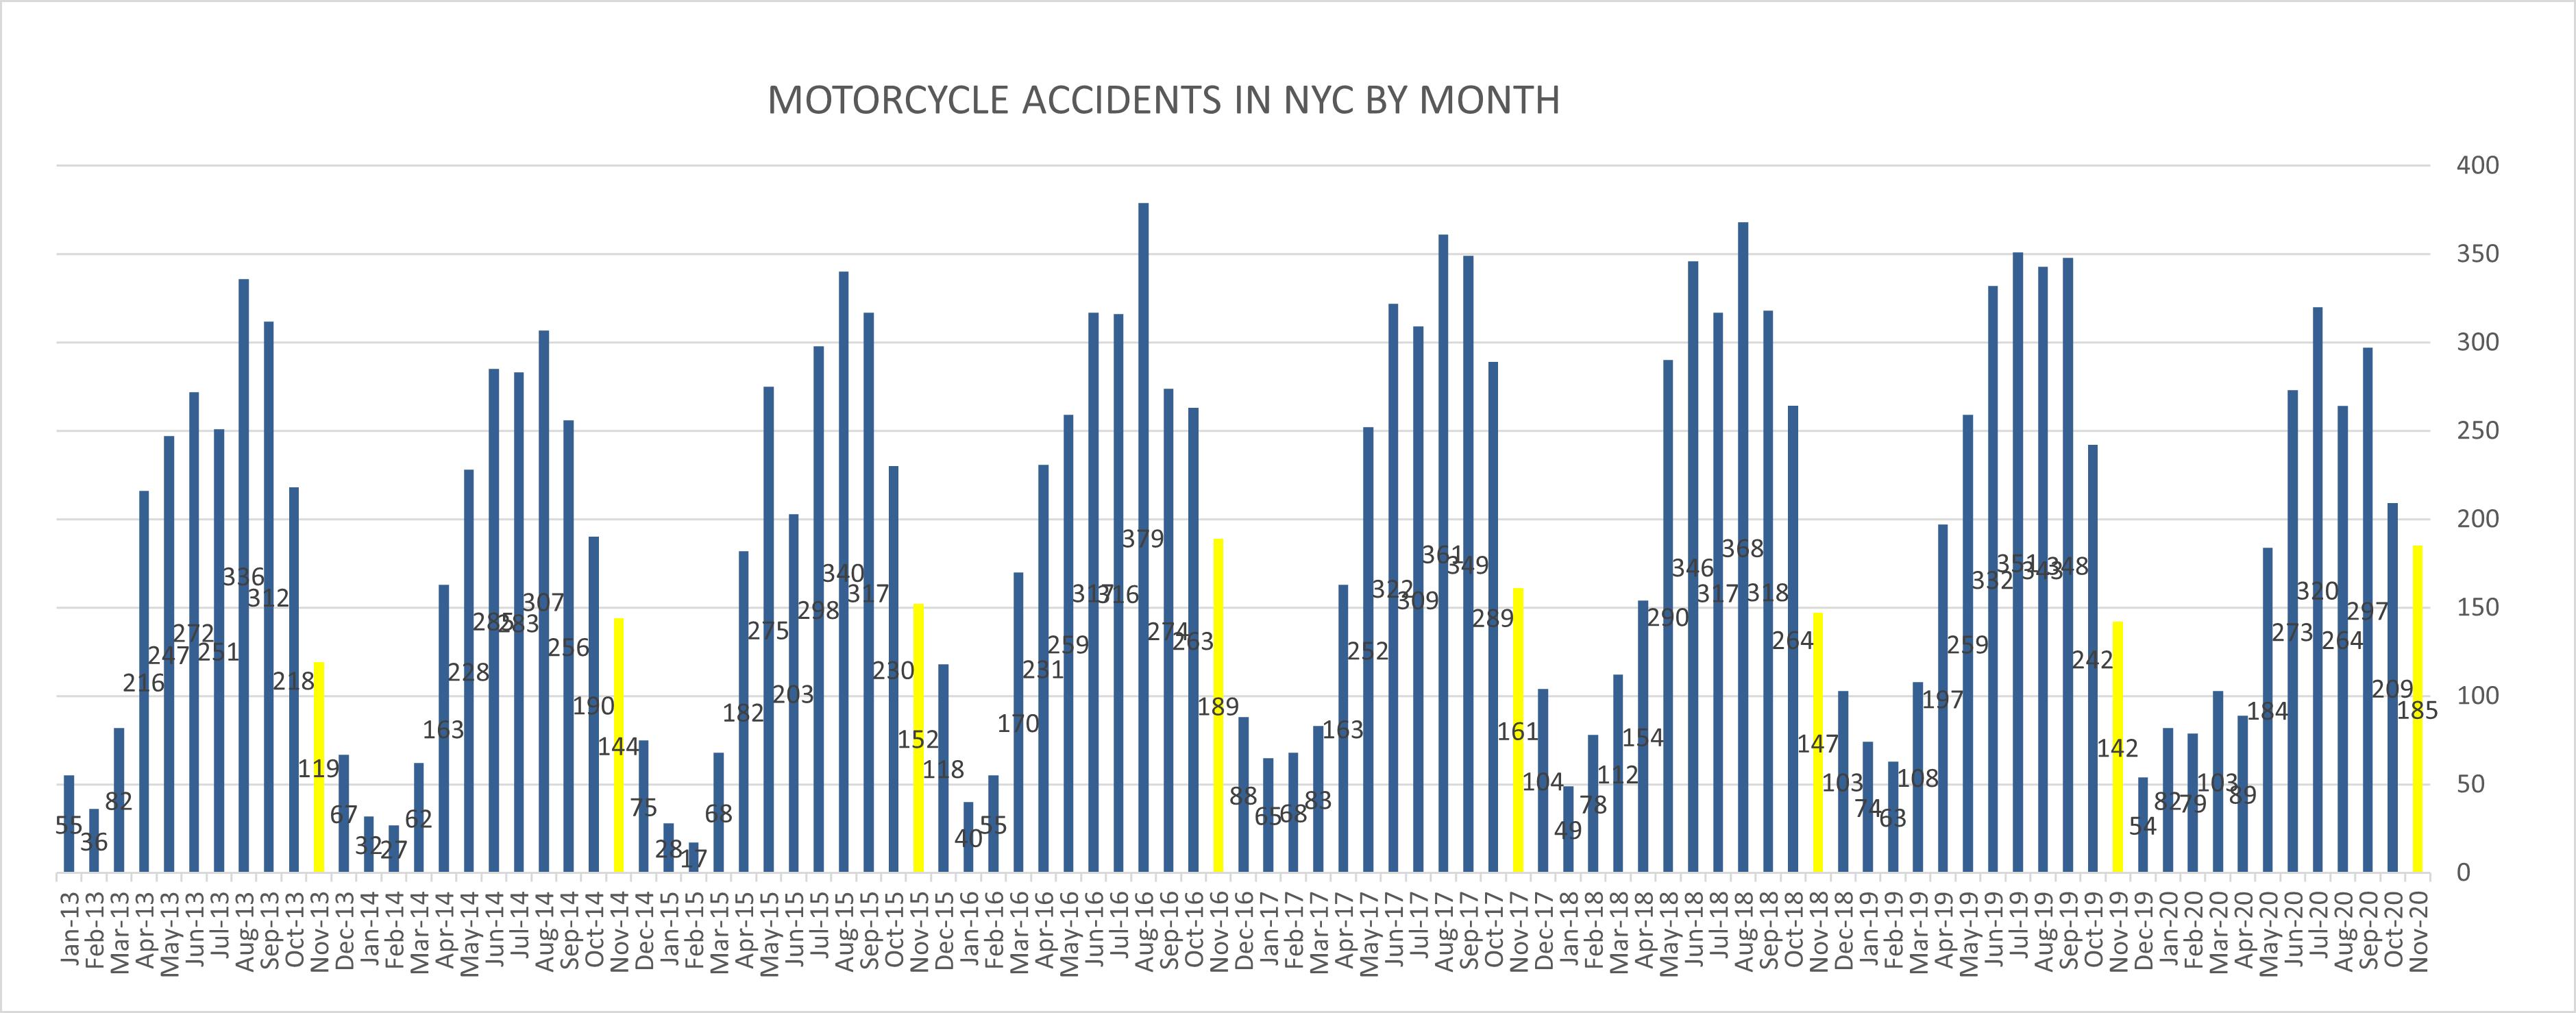 Motorcycle Accidents New York City Nov 20